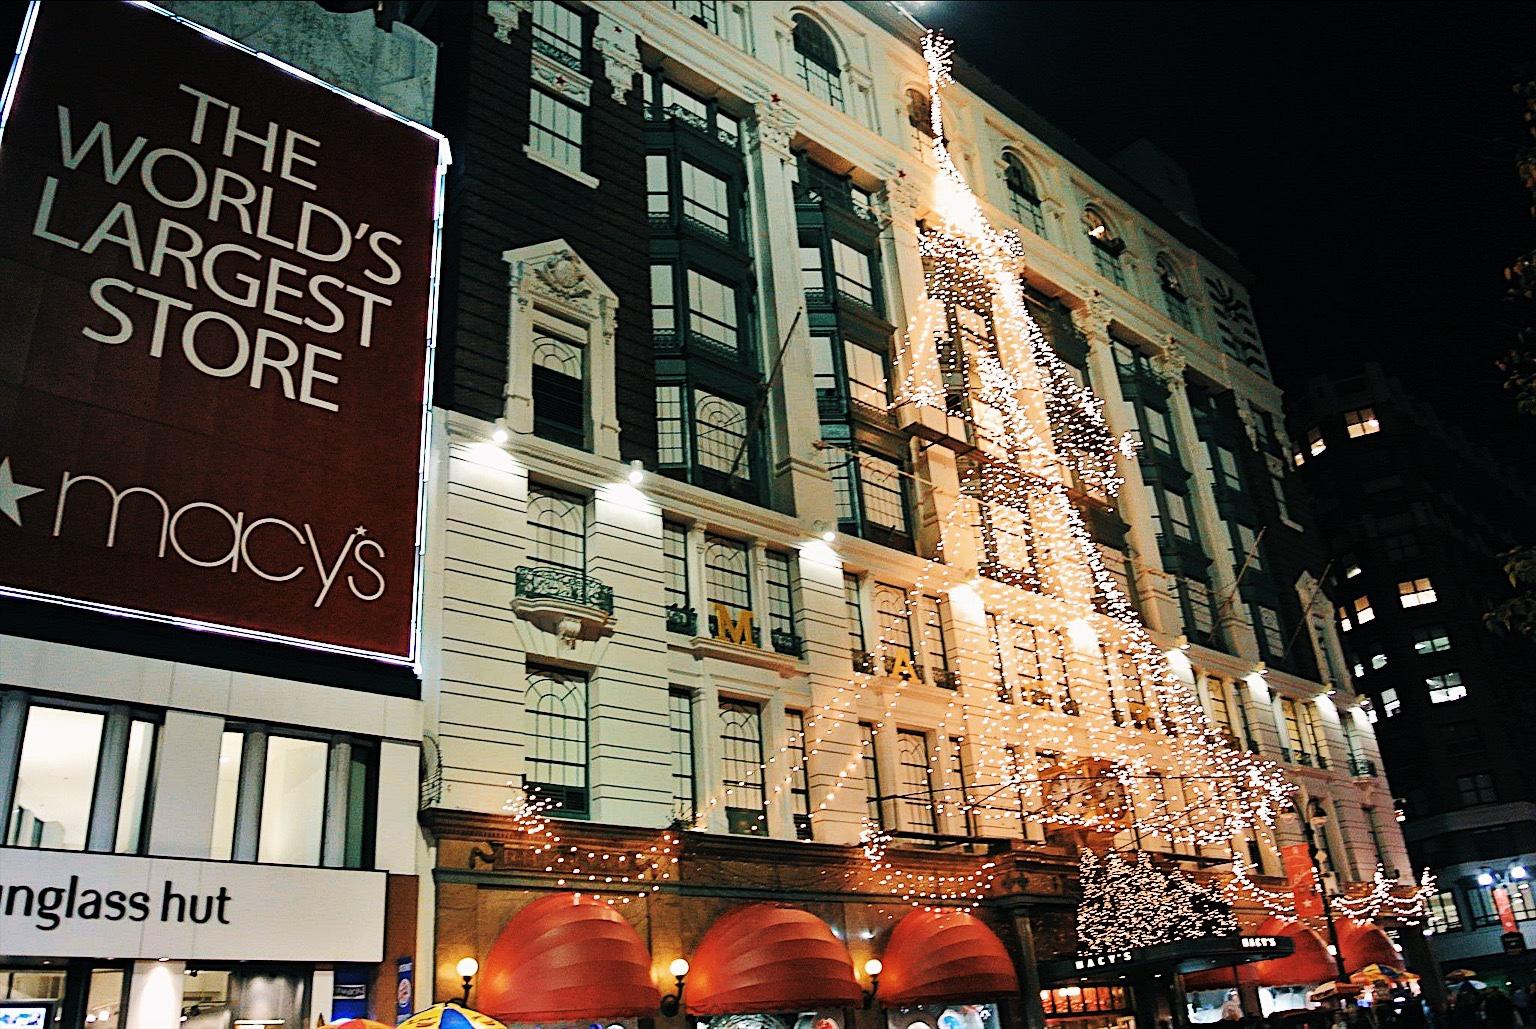 dc75723a 2719 4023 b96e 16bc6c67eb93 - Christmas in New York - ホリデーシーズンのニューヨーク 街に溢れるクリスマスイルミネーション